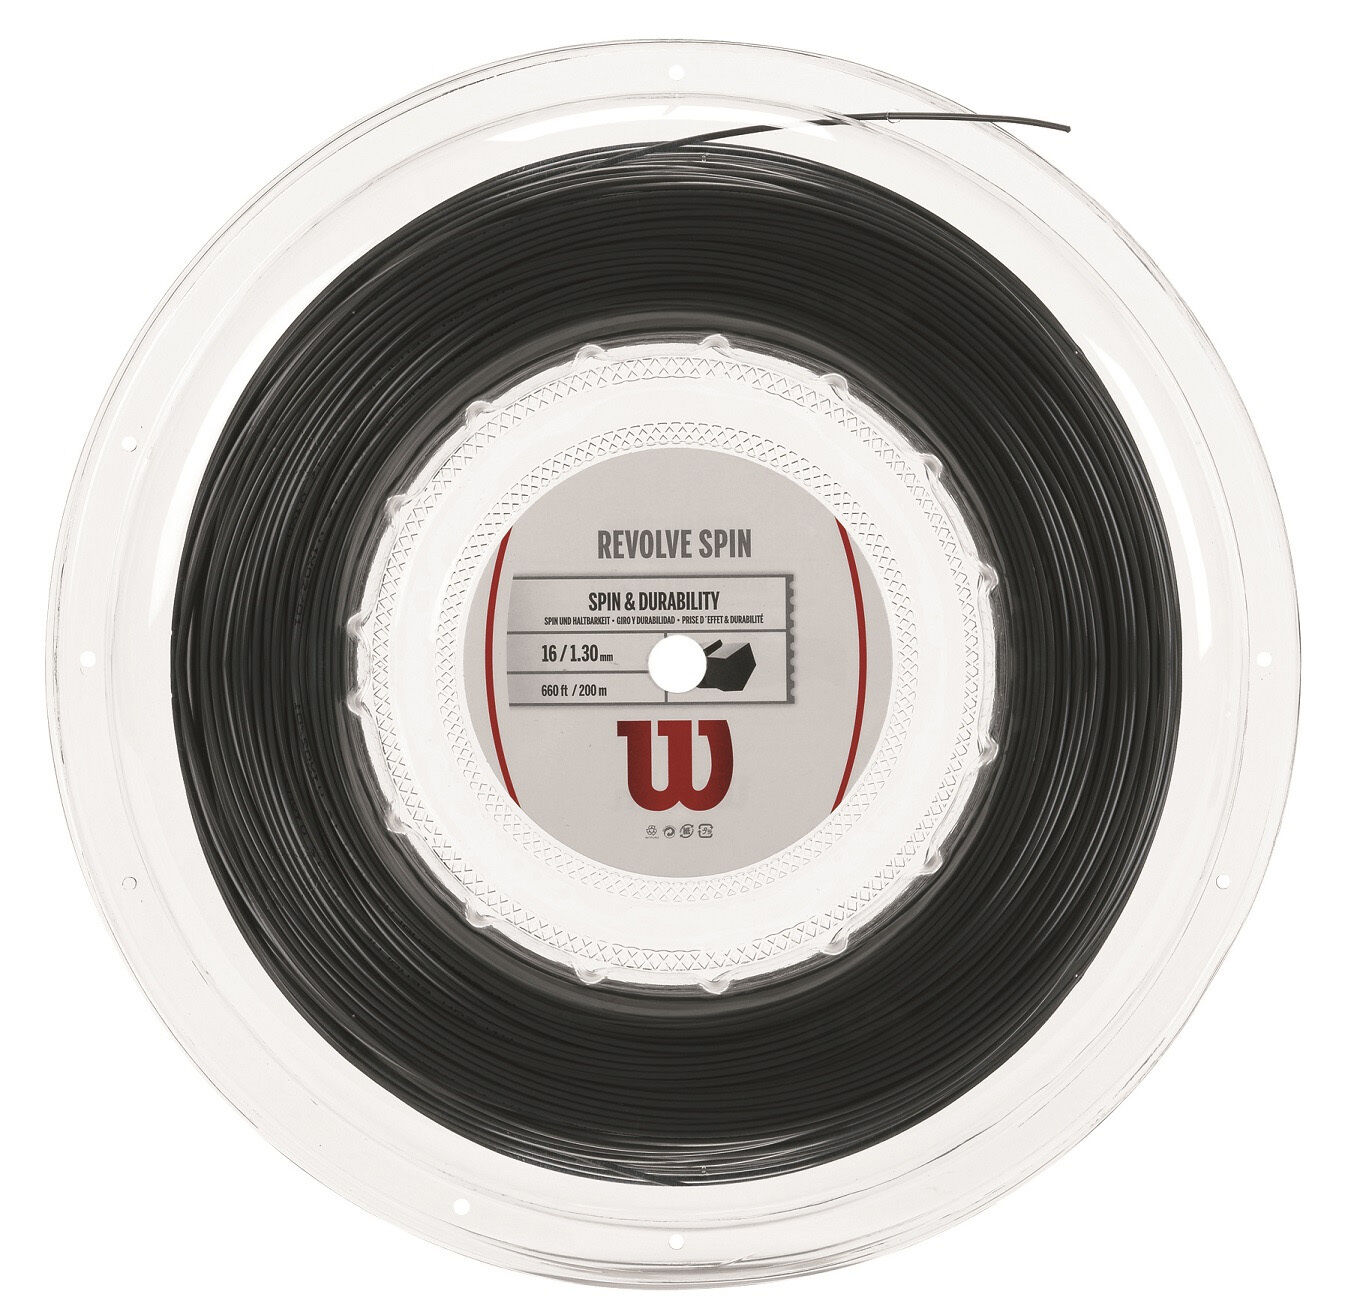 Cadena De Tenis Wilson giran Spin 16 200 M 660 ft carrete-Negro-AUTH distribuidor